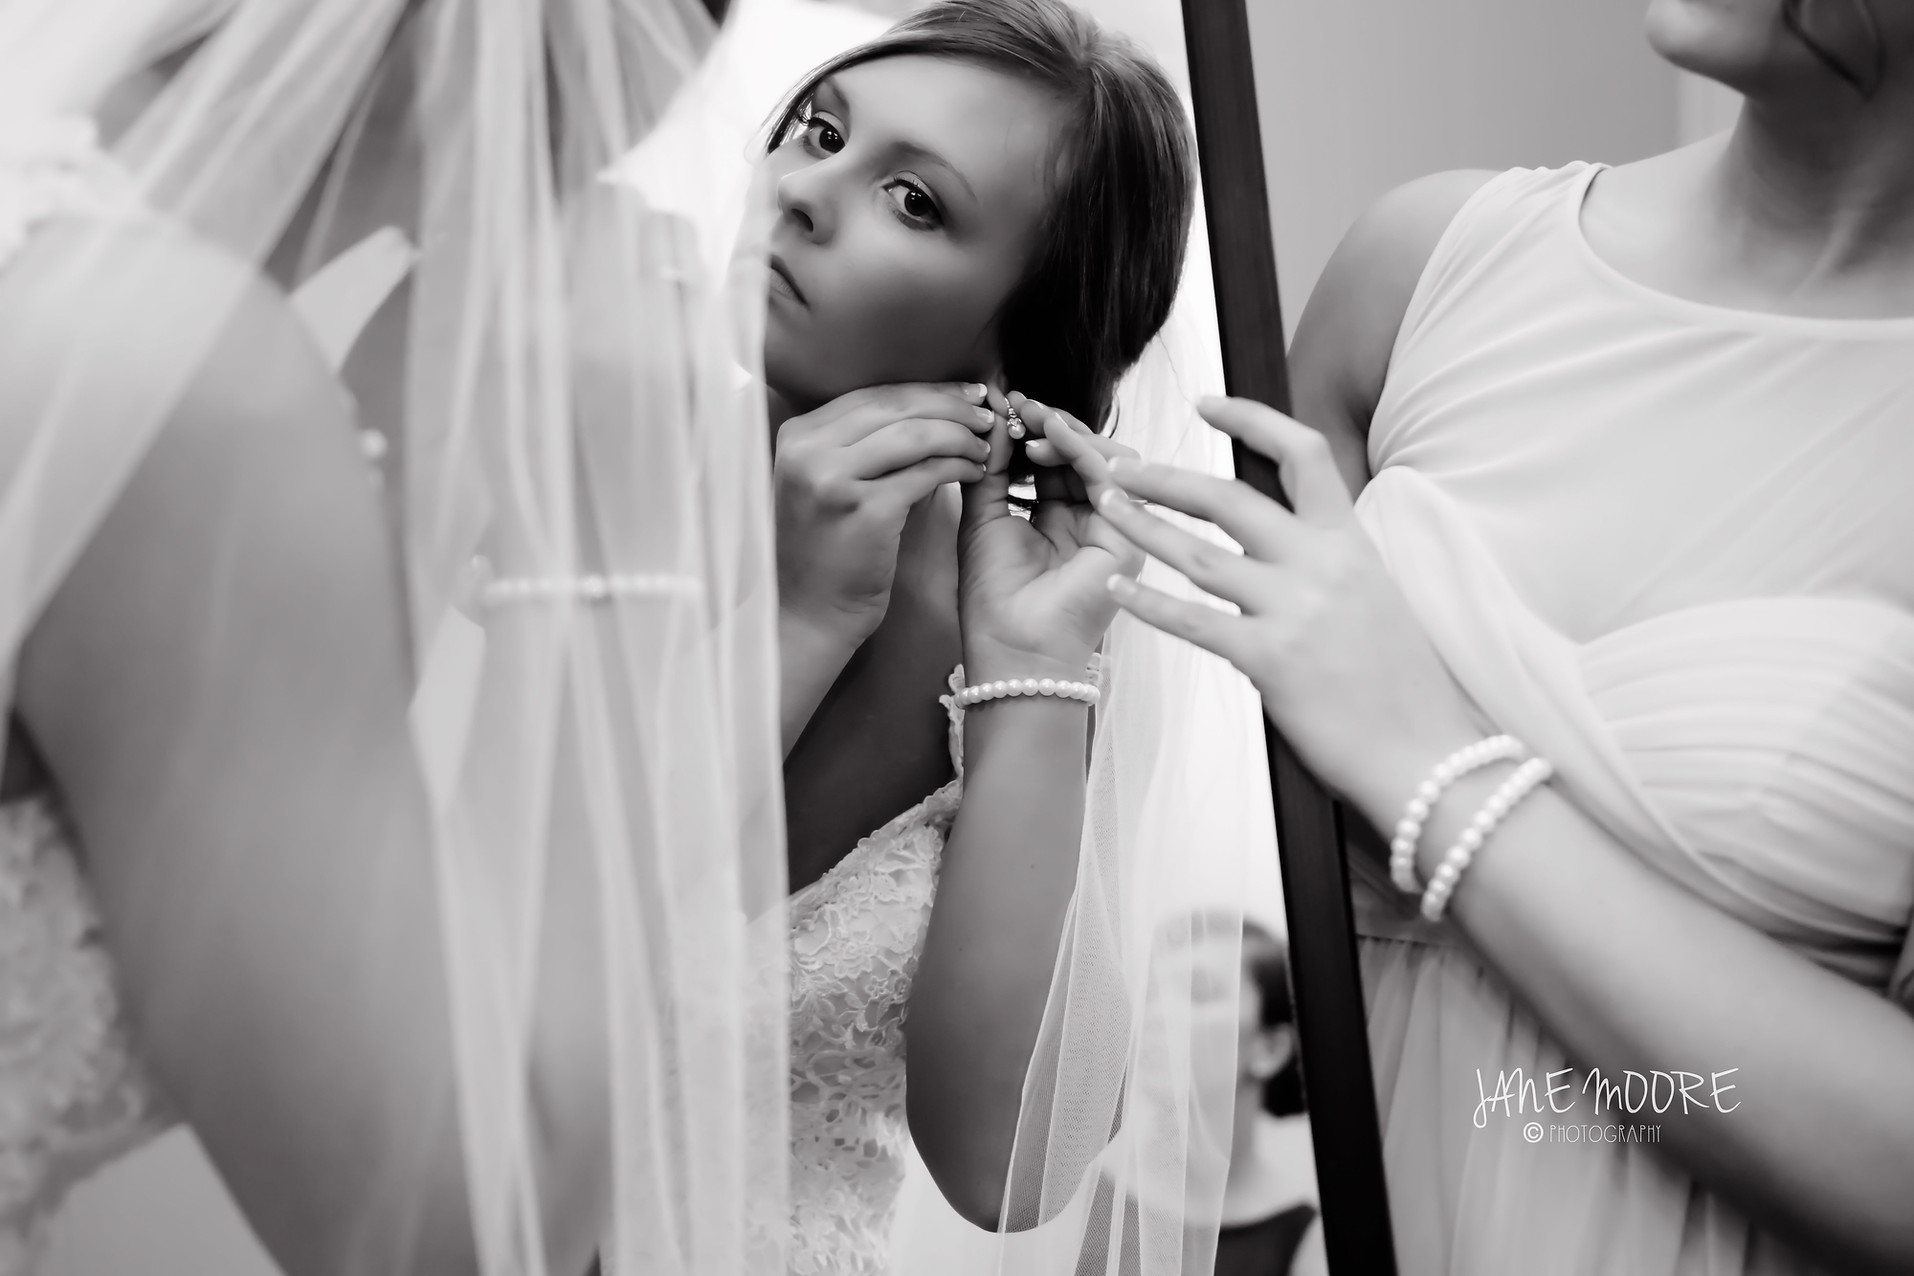 Wedding prep photo finishing touches